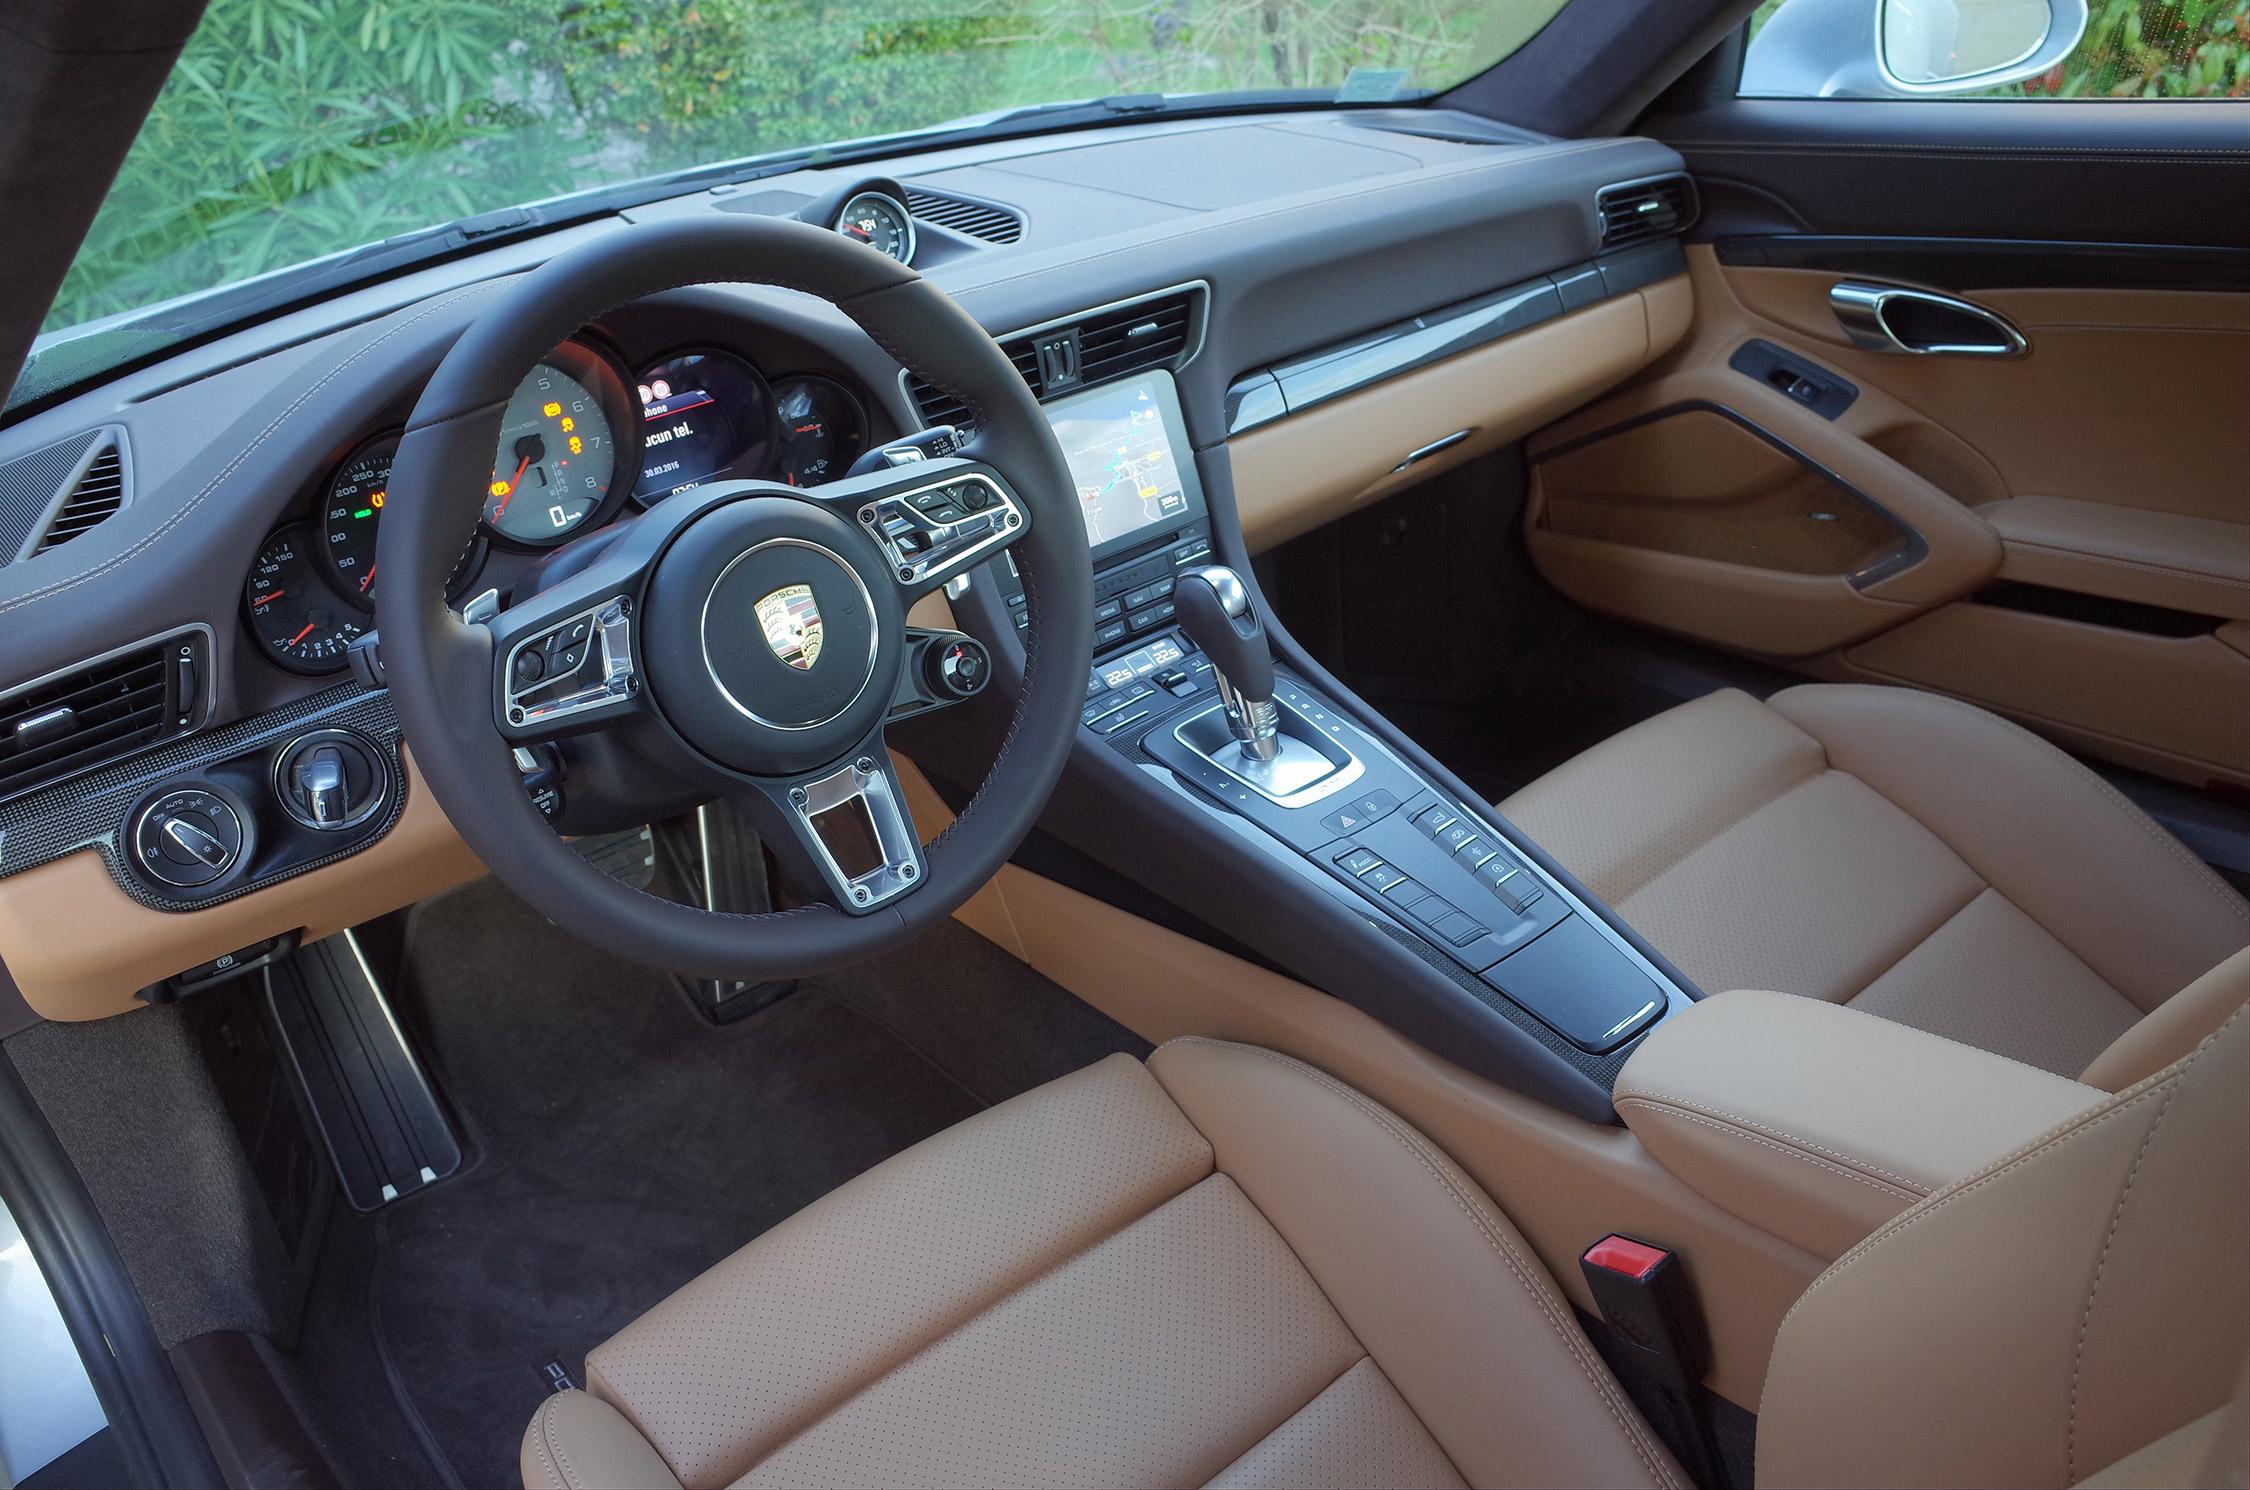 Essai porsche 911 991 carrera 4s 420 ch motorlegend for Porsche 996 interieur